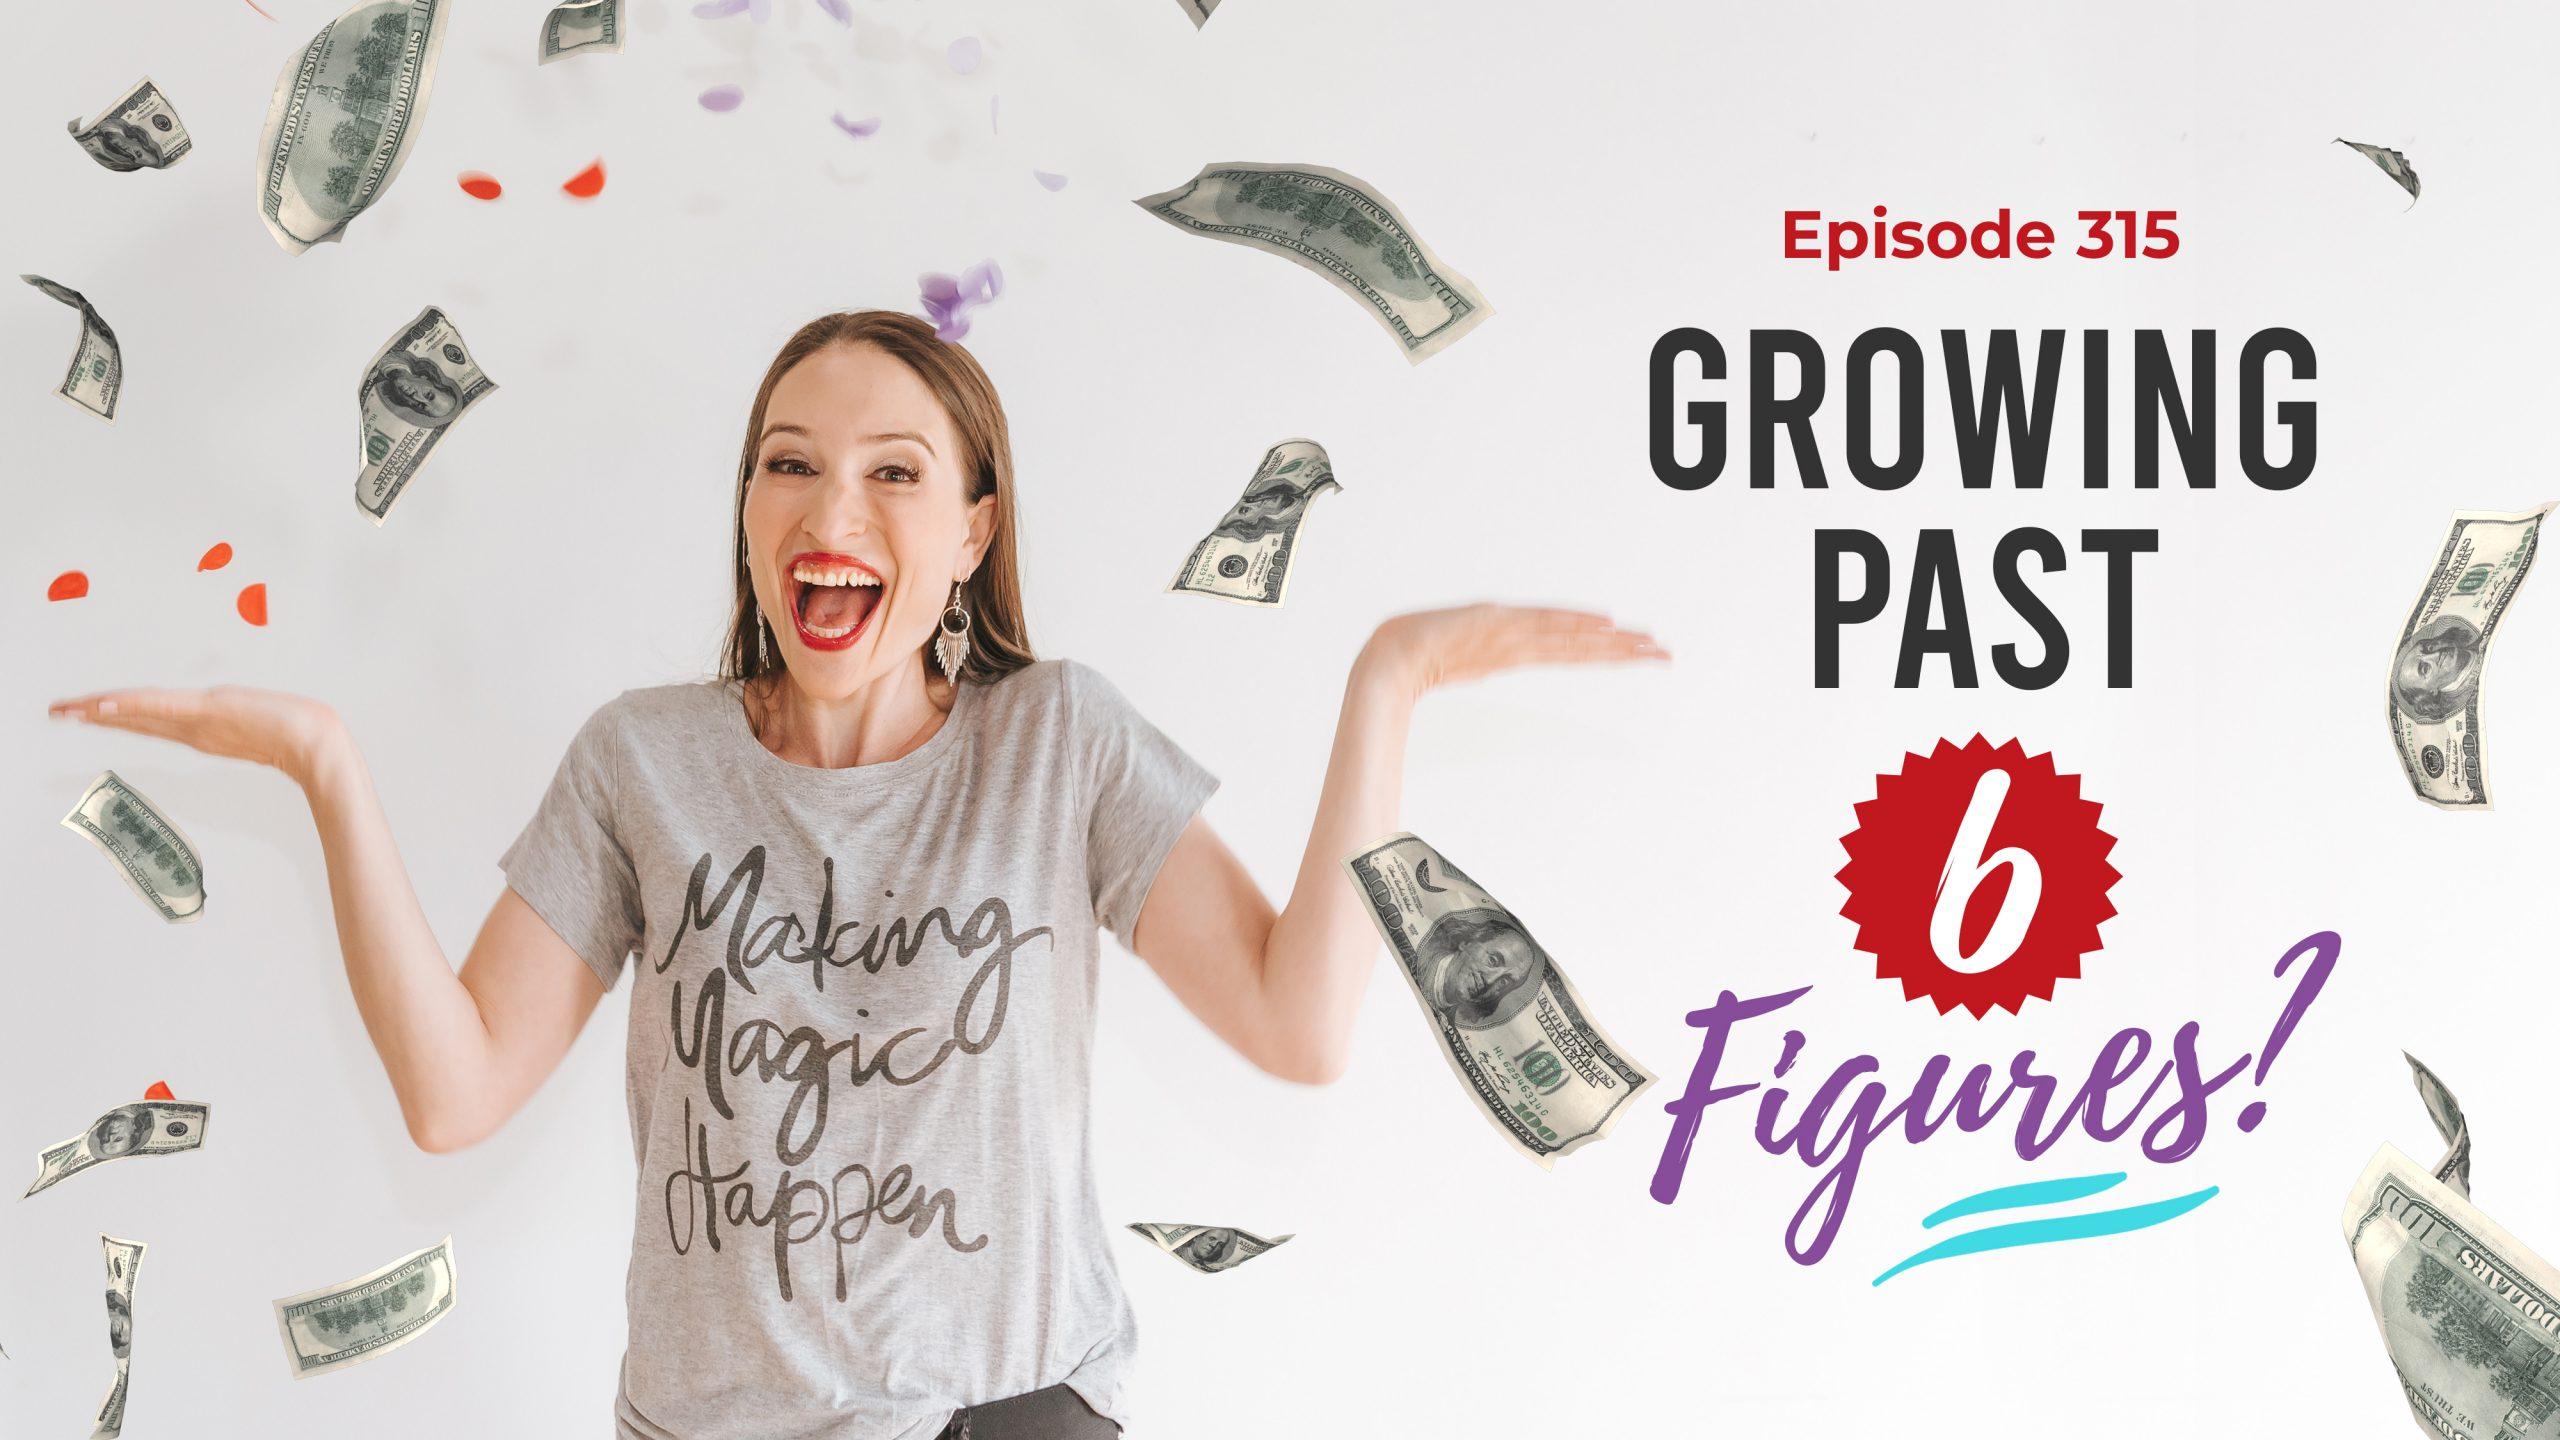 Ep. 315: Growing Past 6 Figures